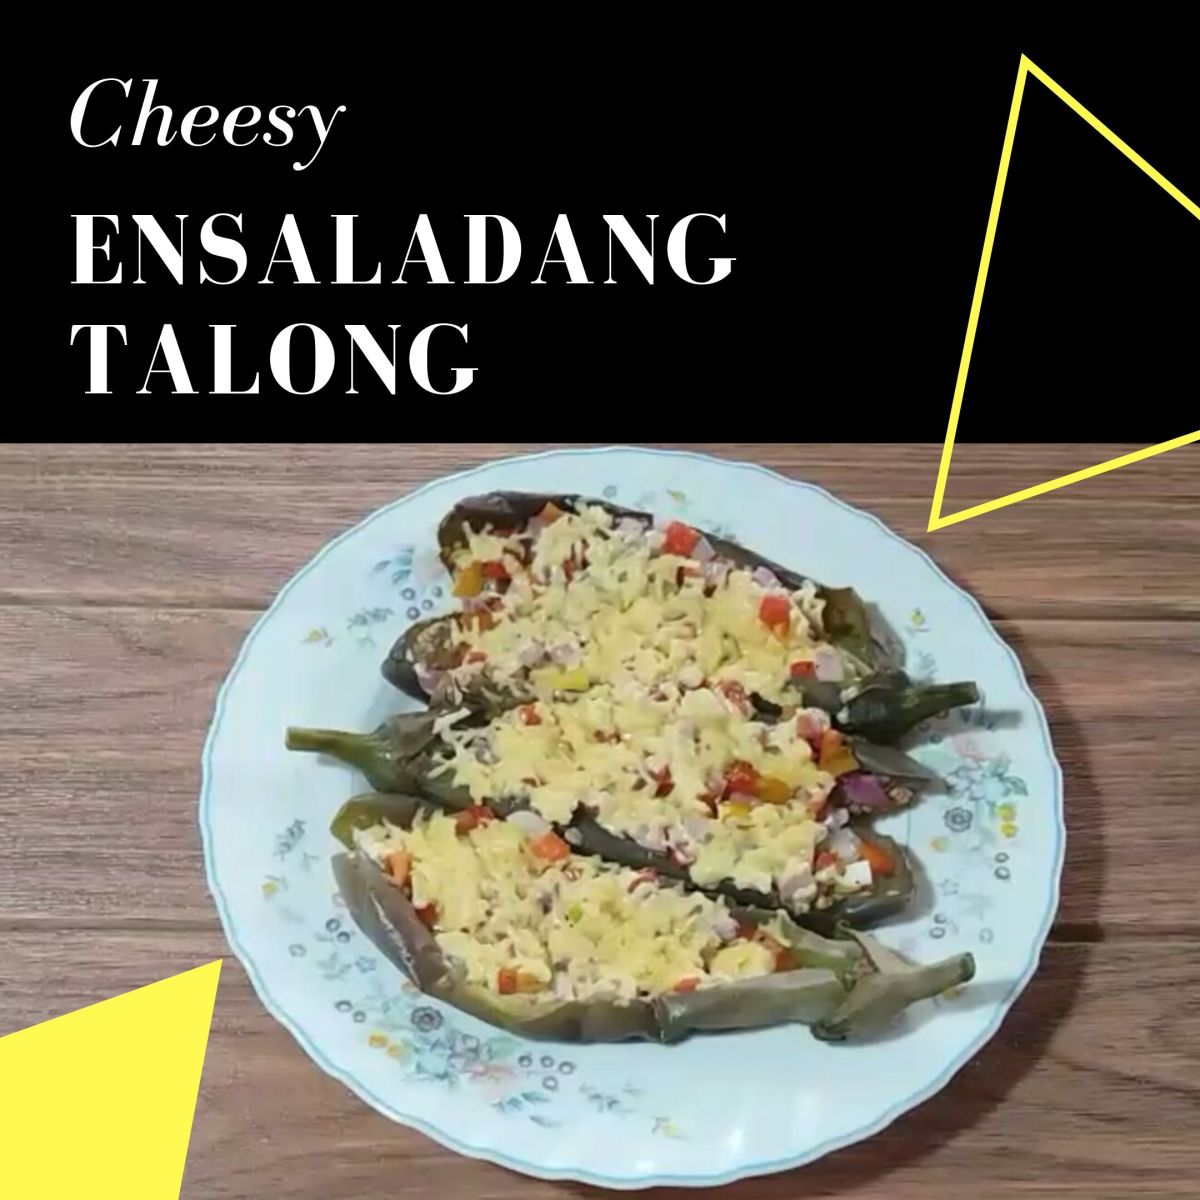 How to Cook Cheesy Ensaladang Talong (Eggplant Salad)